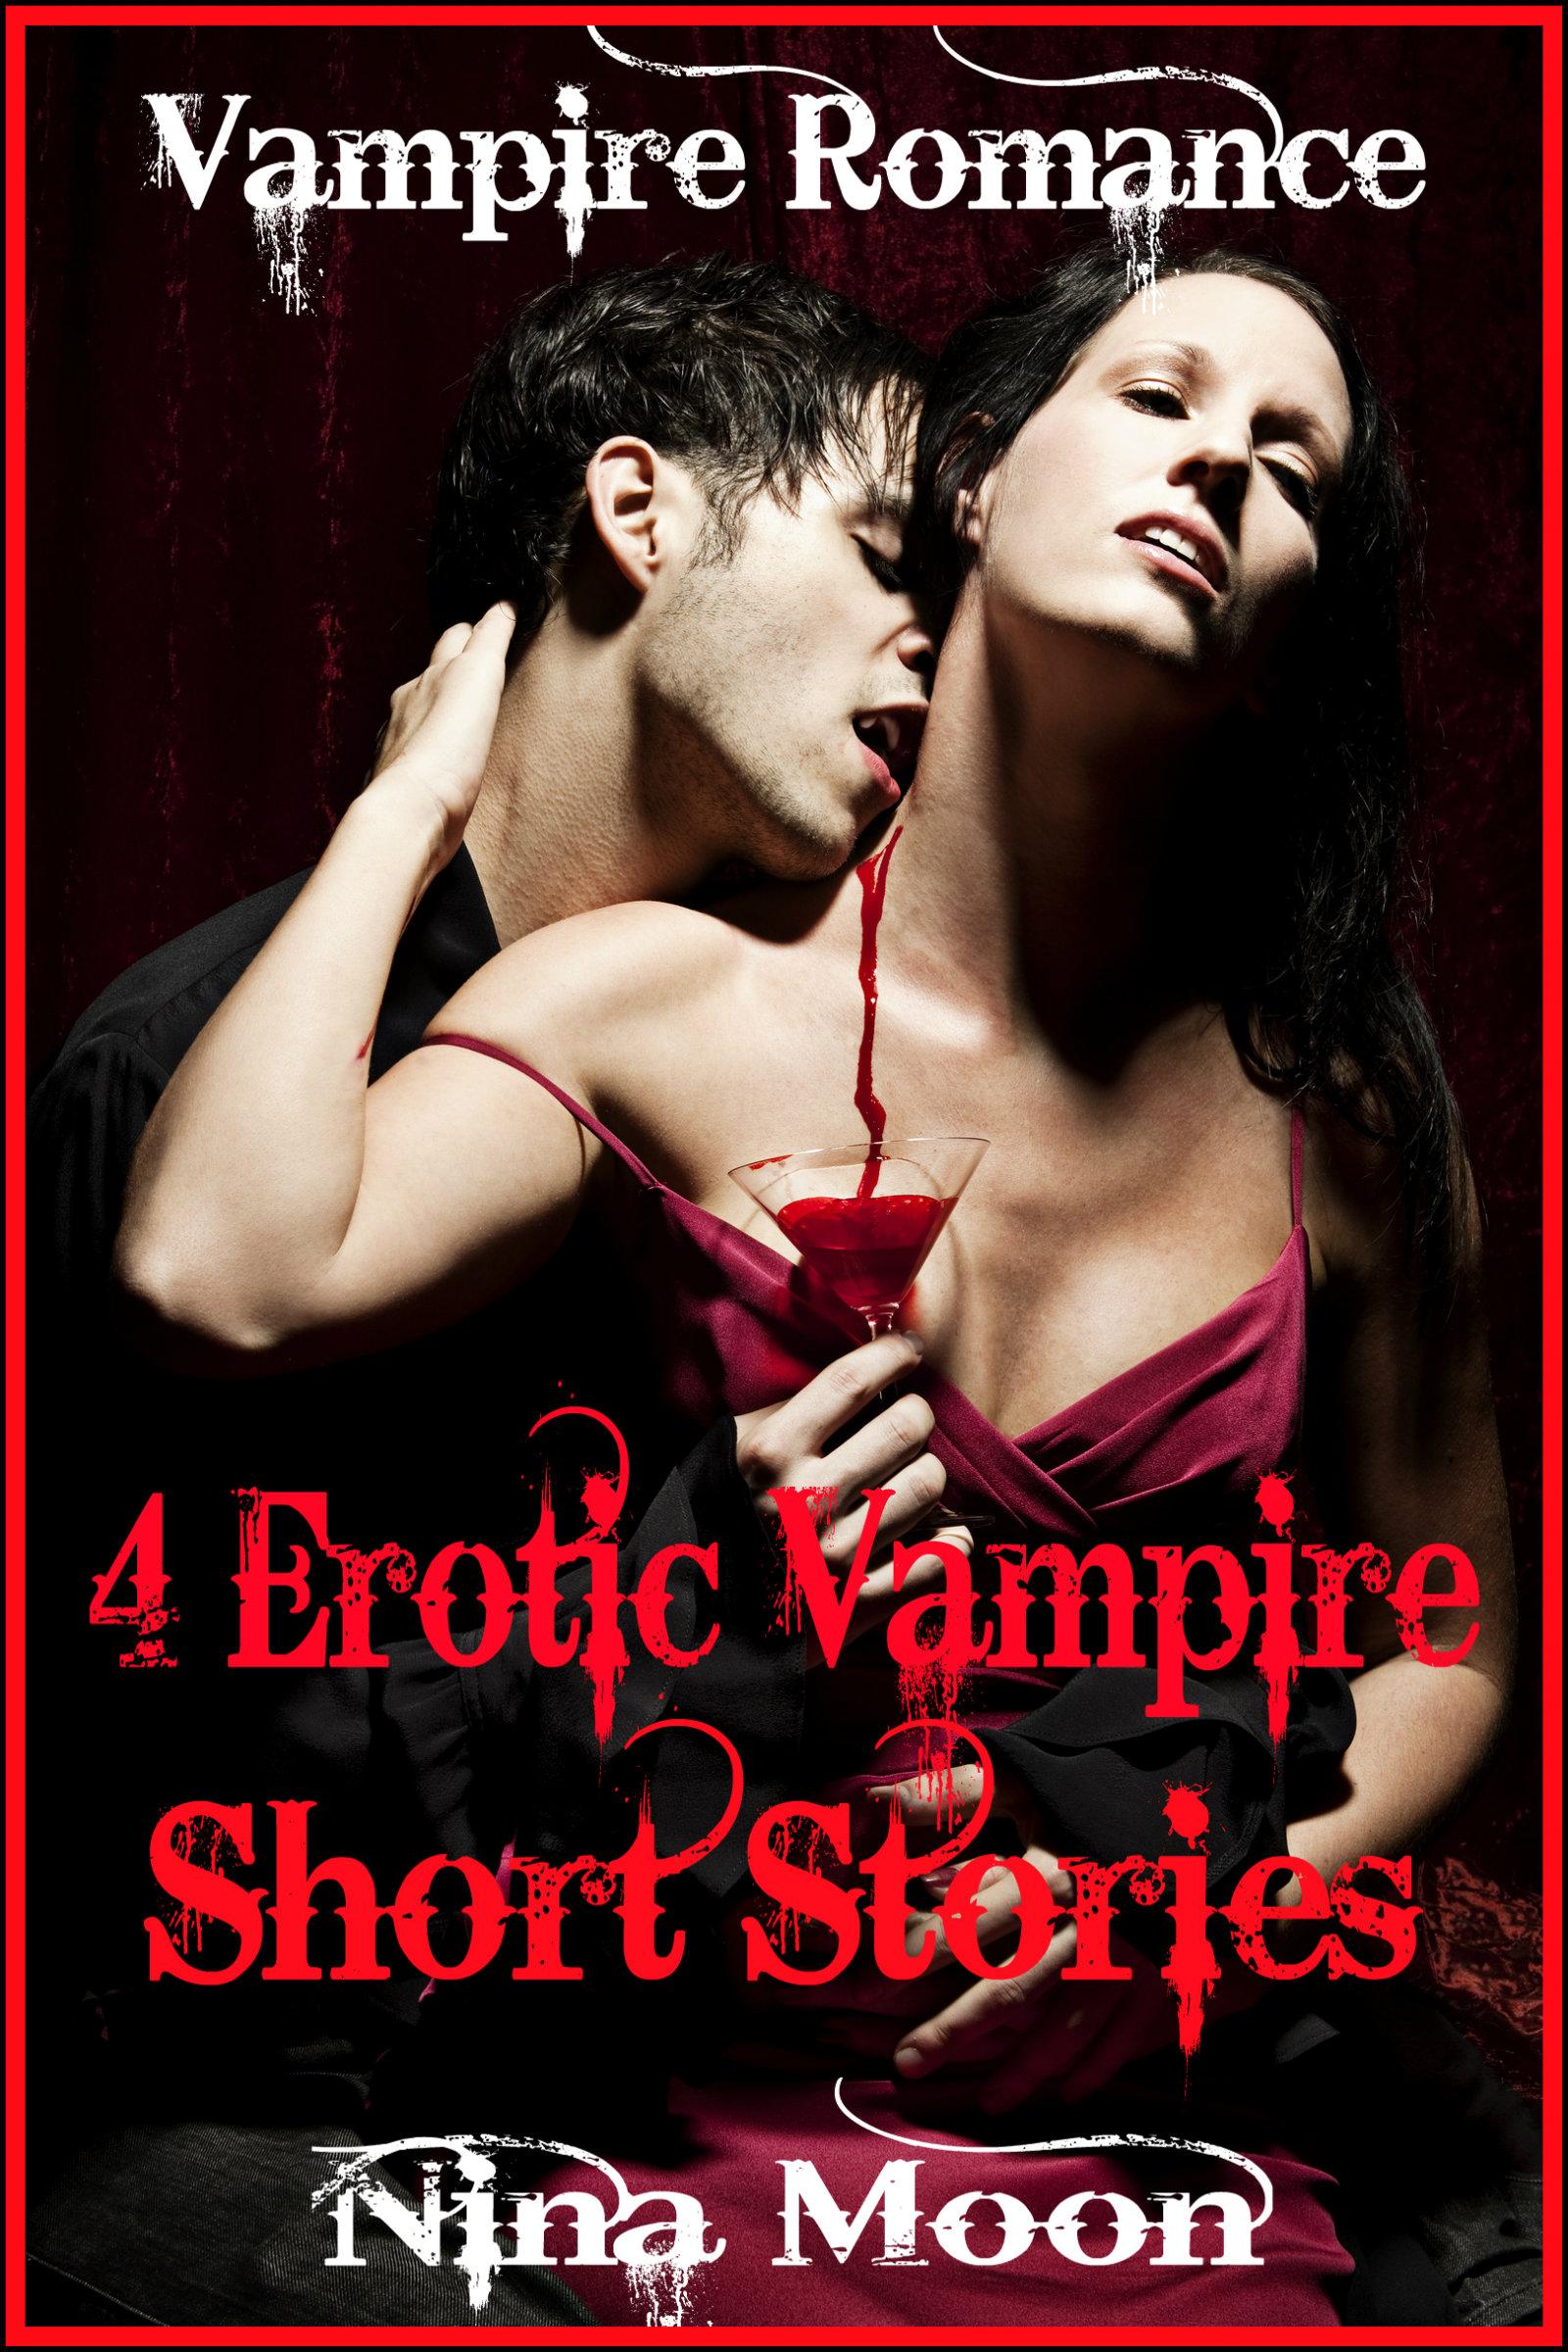 Vampire romance porn pics erotic scenes